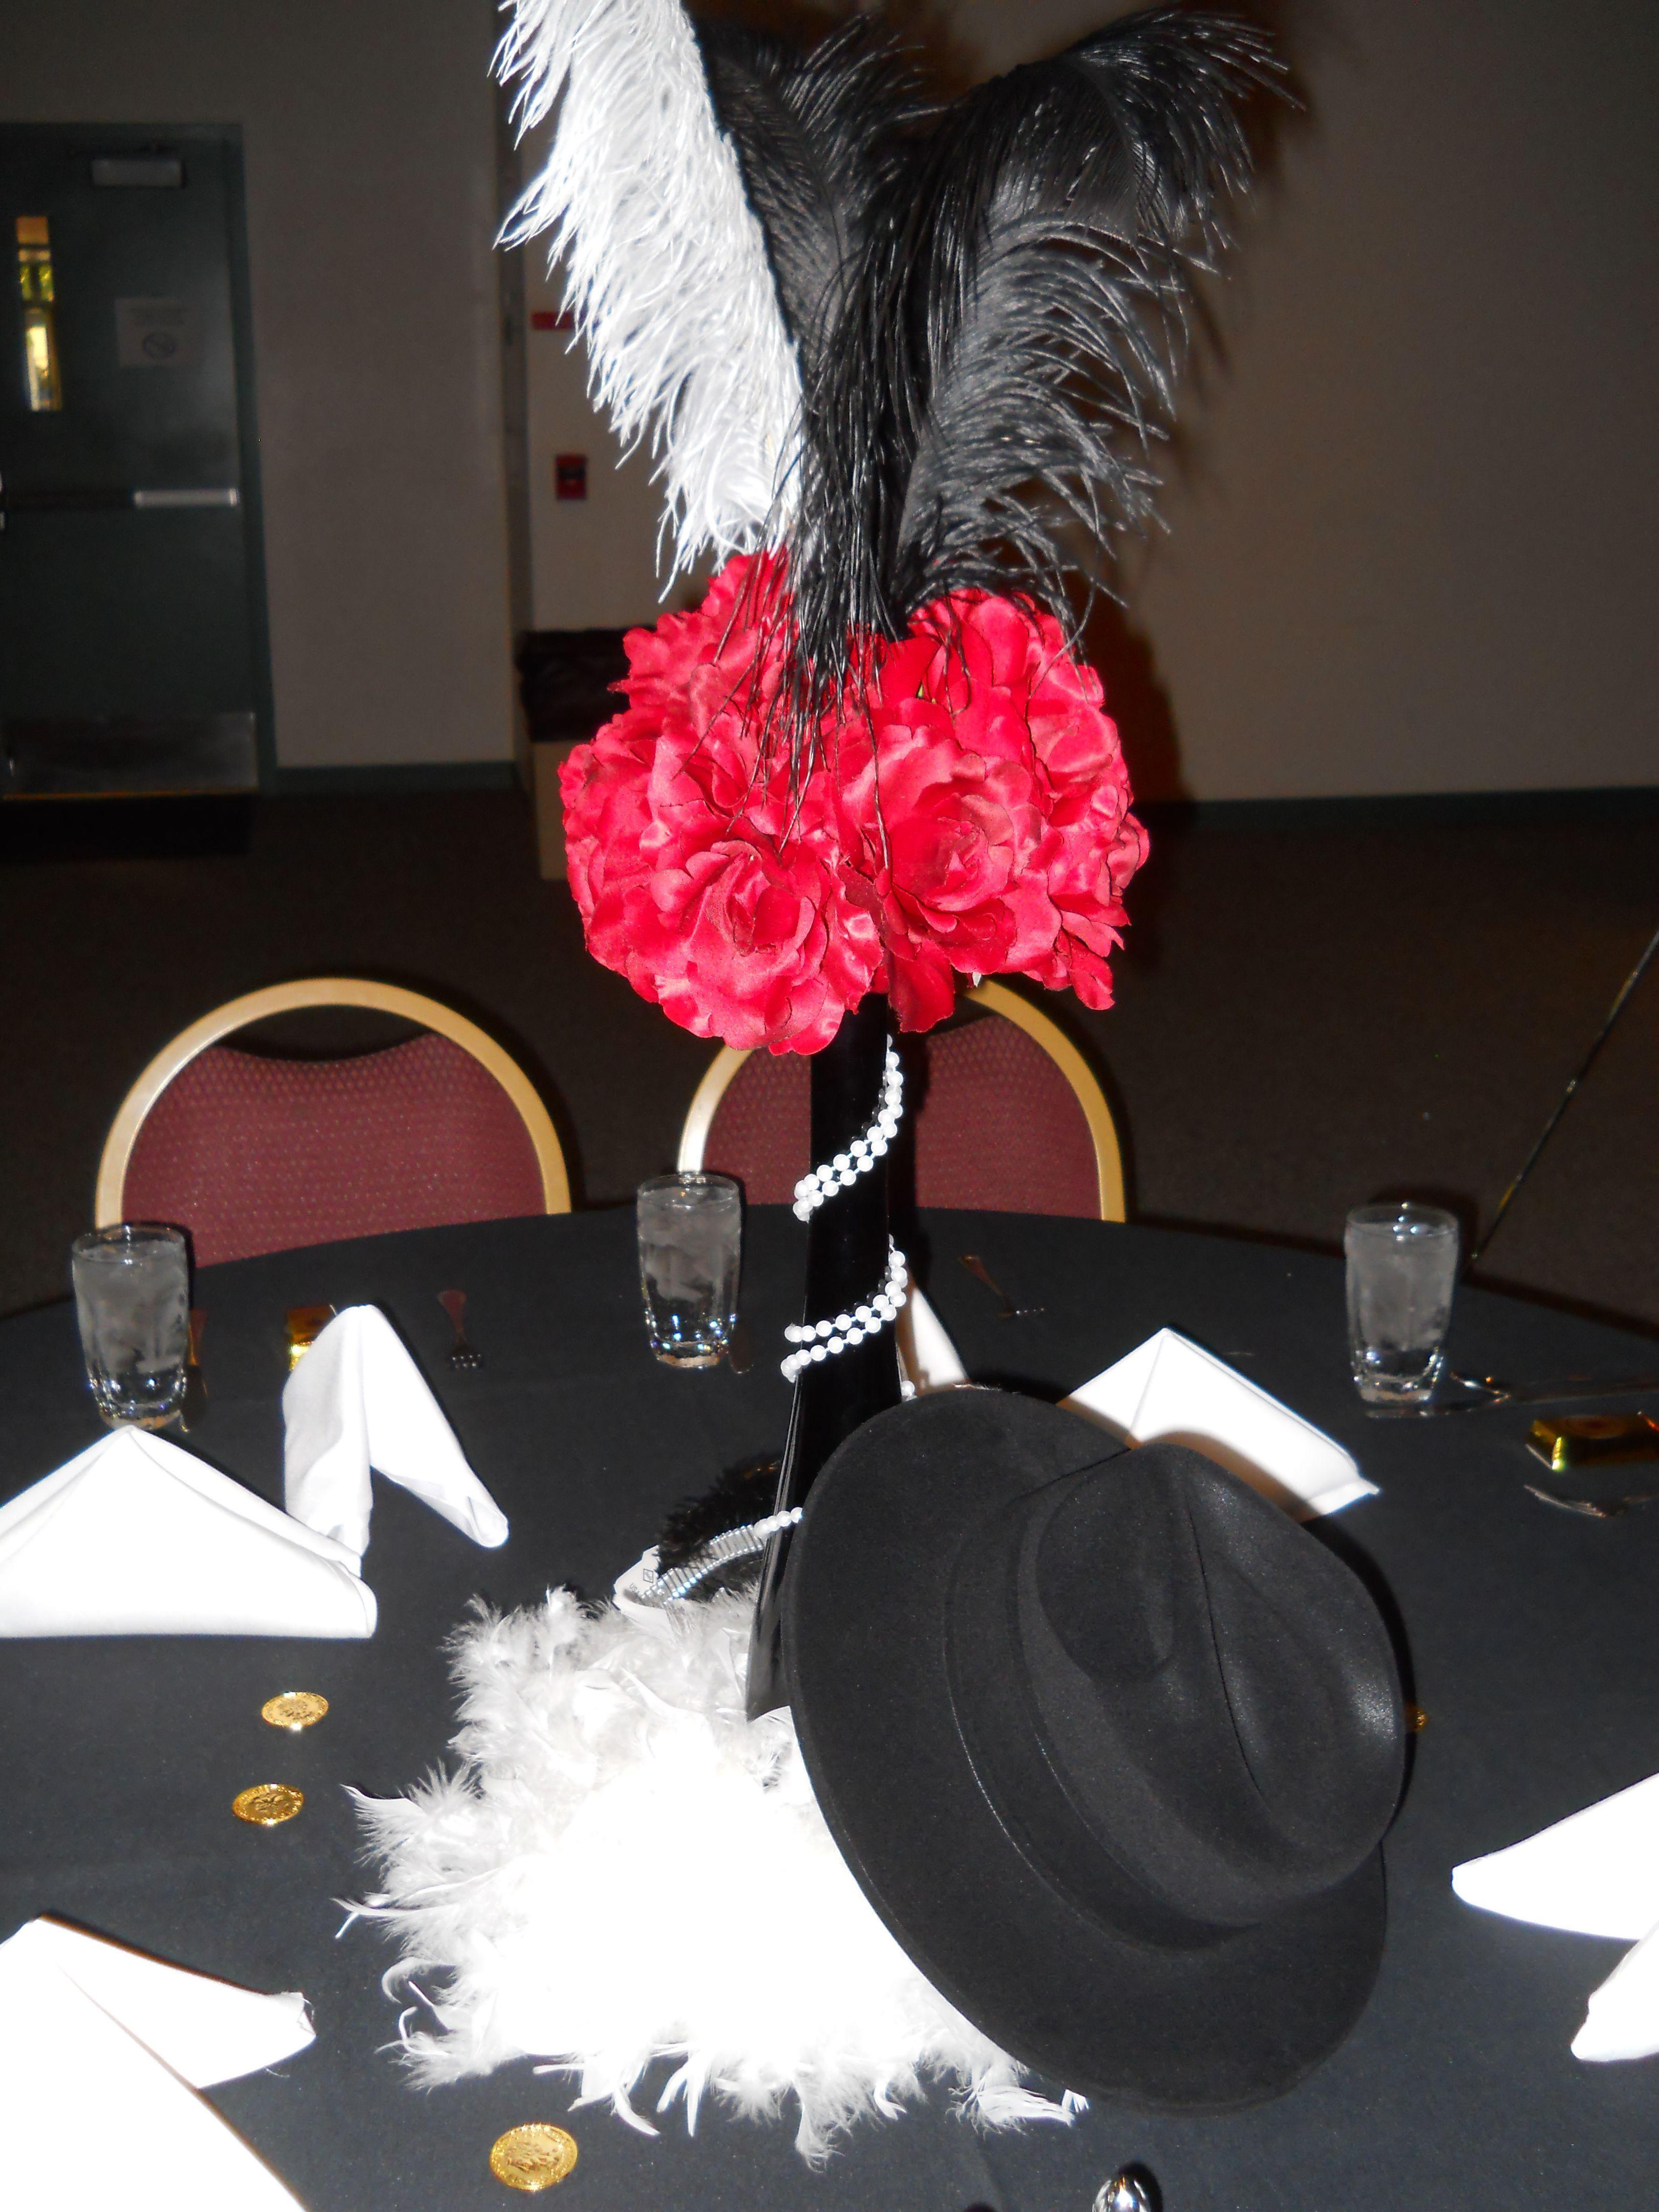 21 Elegant Harlem Nights Party Decorations Wedding Decoration